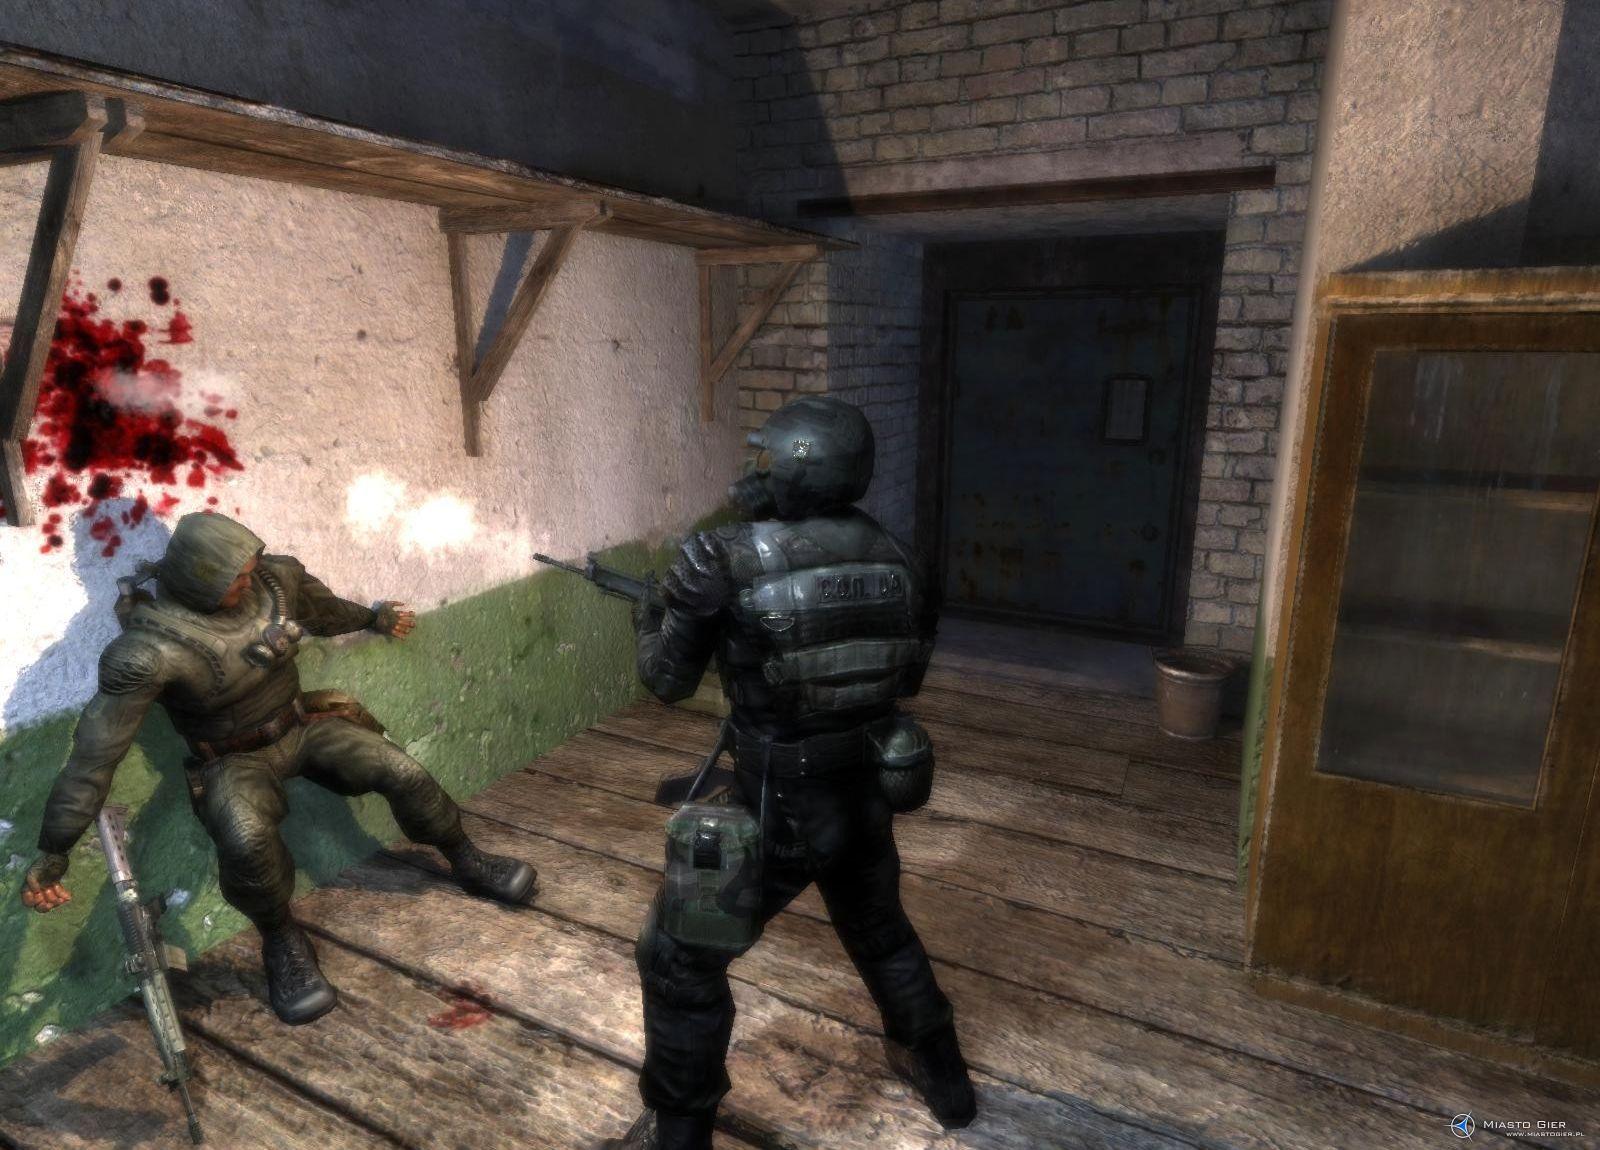 Nowe screeny z gry S.T.A.L.K.E.R.: Shadow of Chernobyl